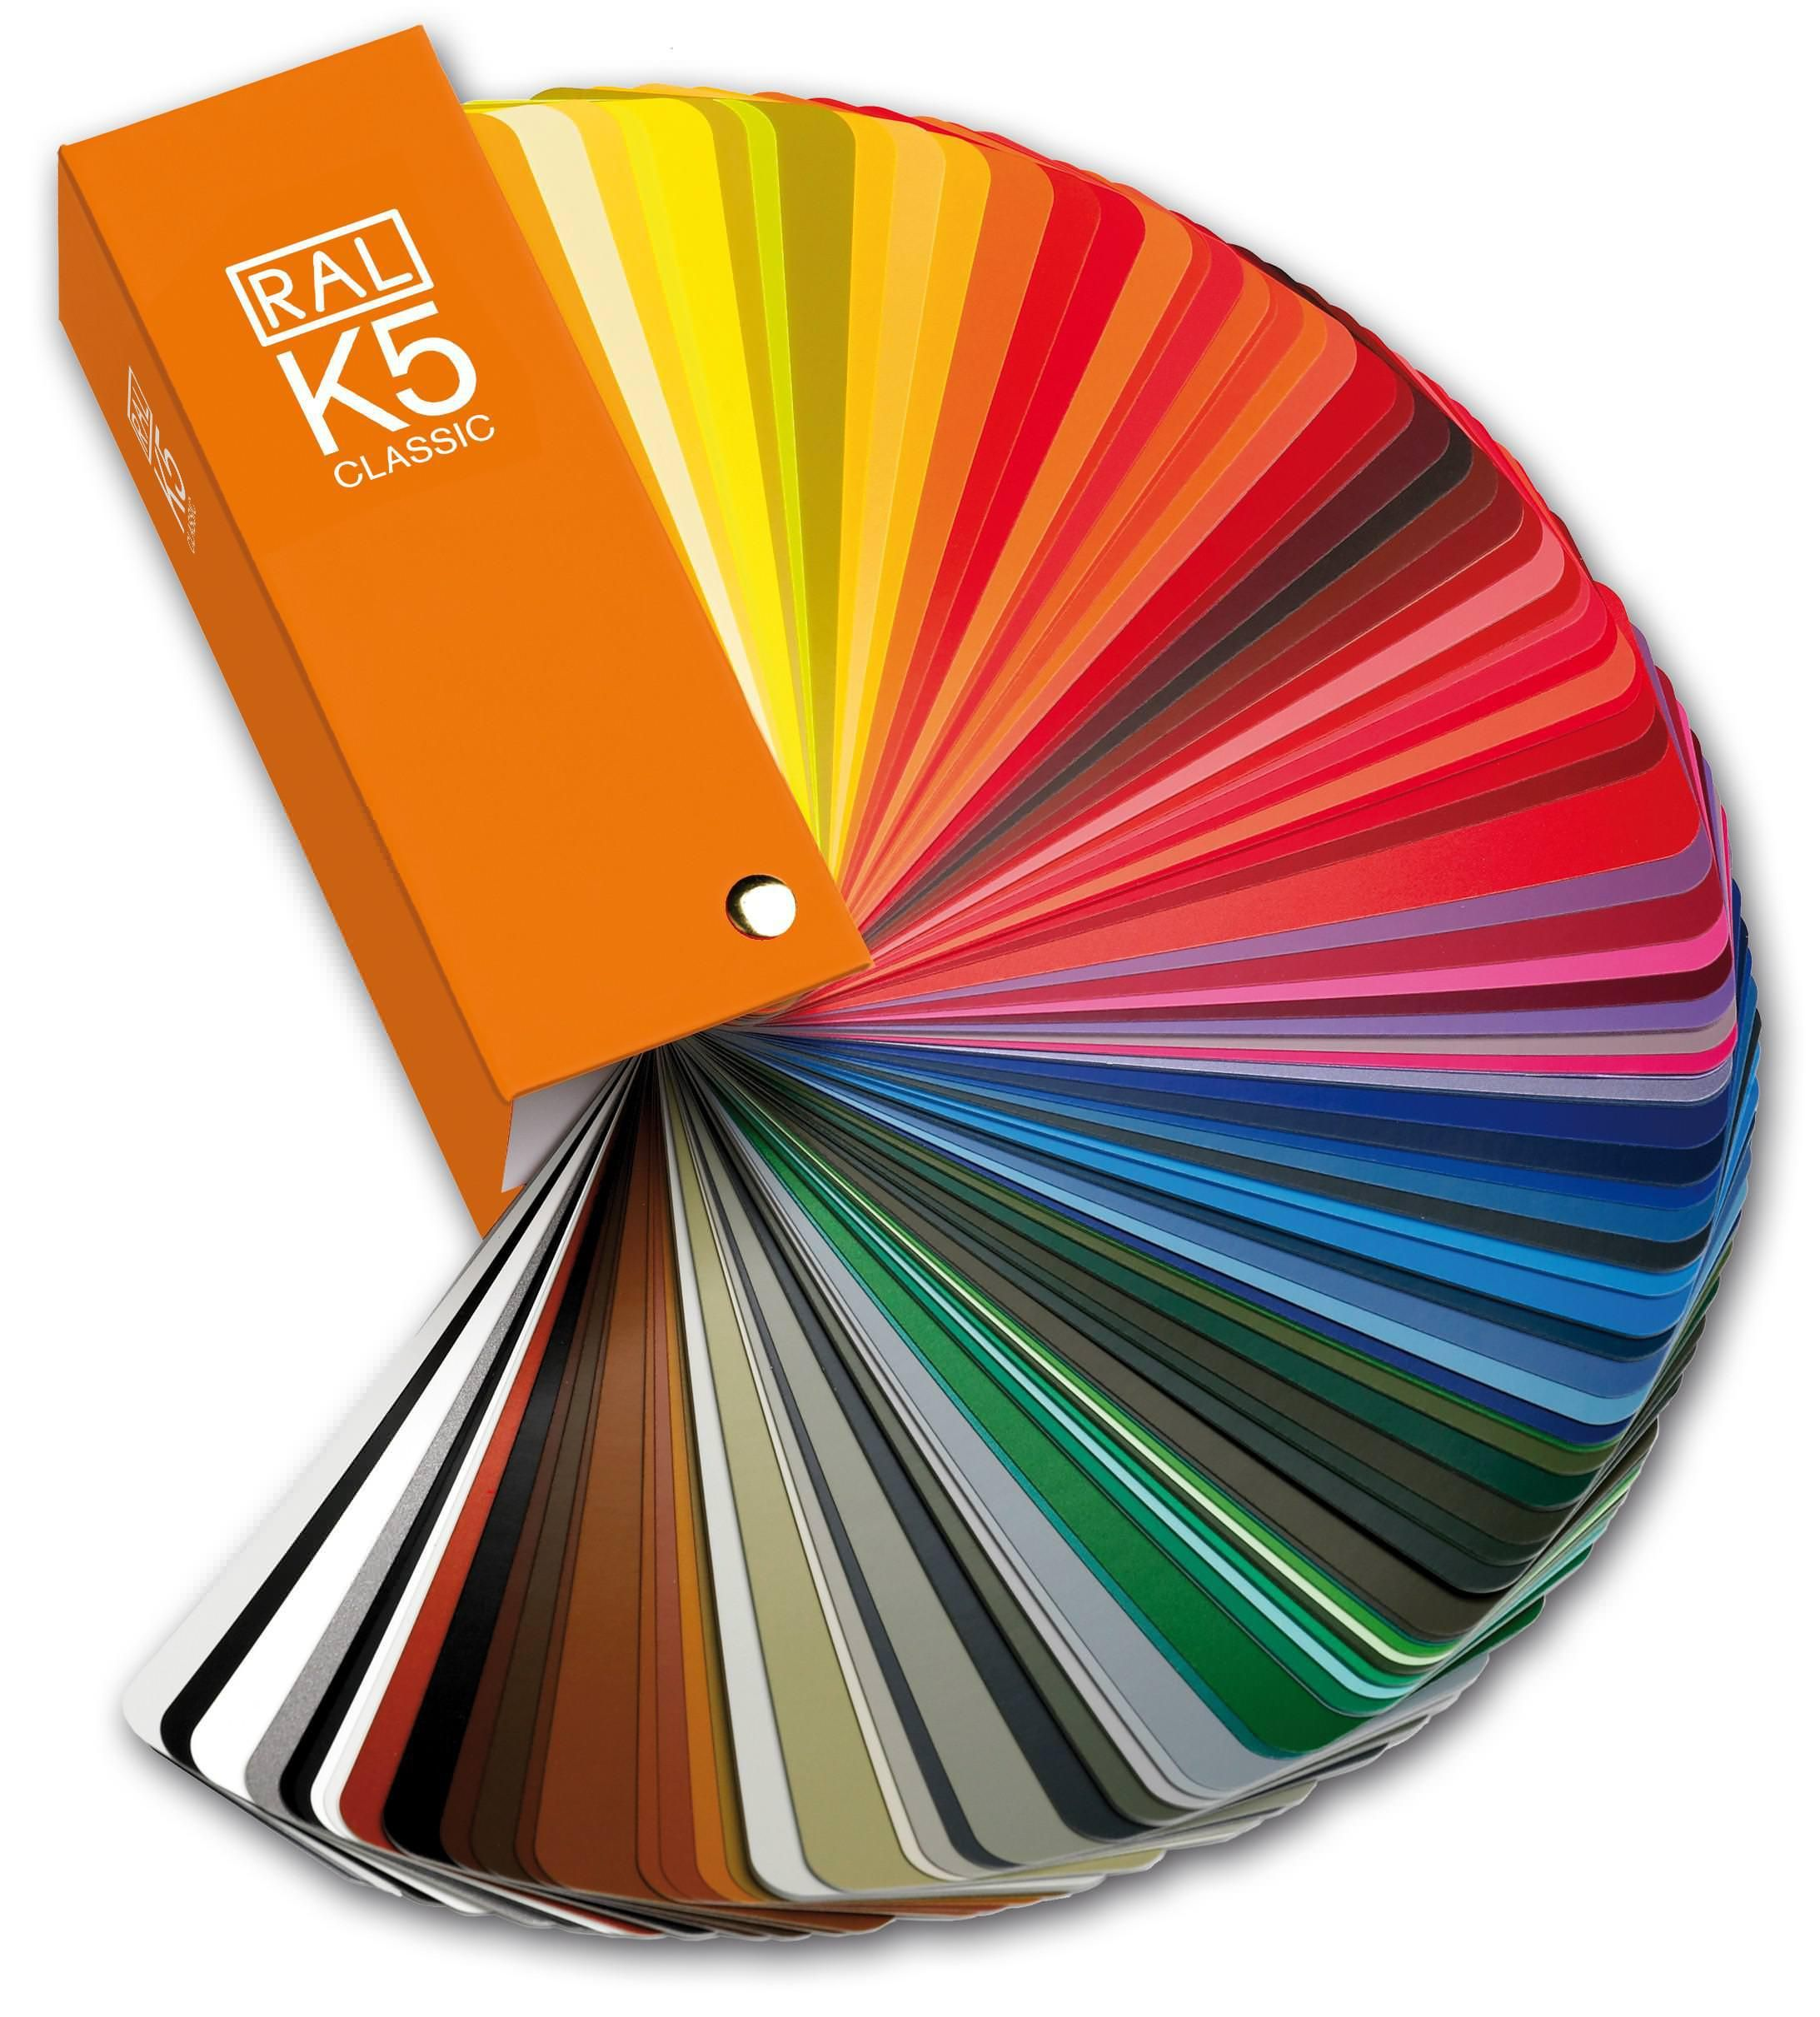 color wheel paint company hq kitchen hallway pinterest material farben und wintergarten. Black Bedroom Furniture Sets. Home Design Ideas